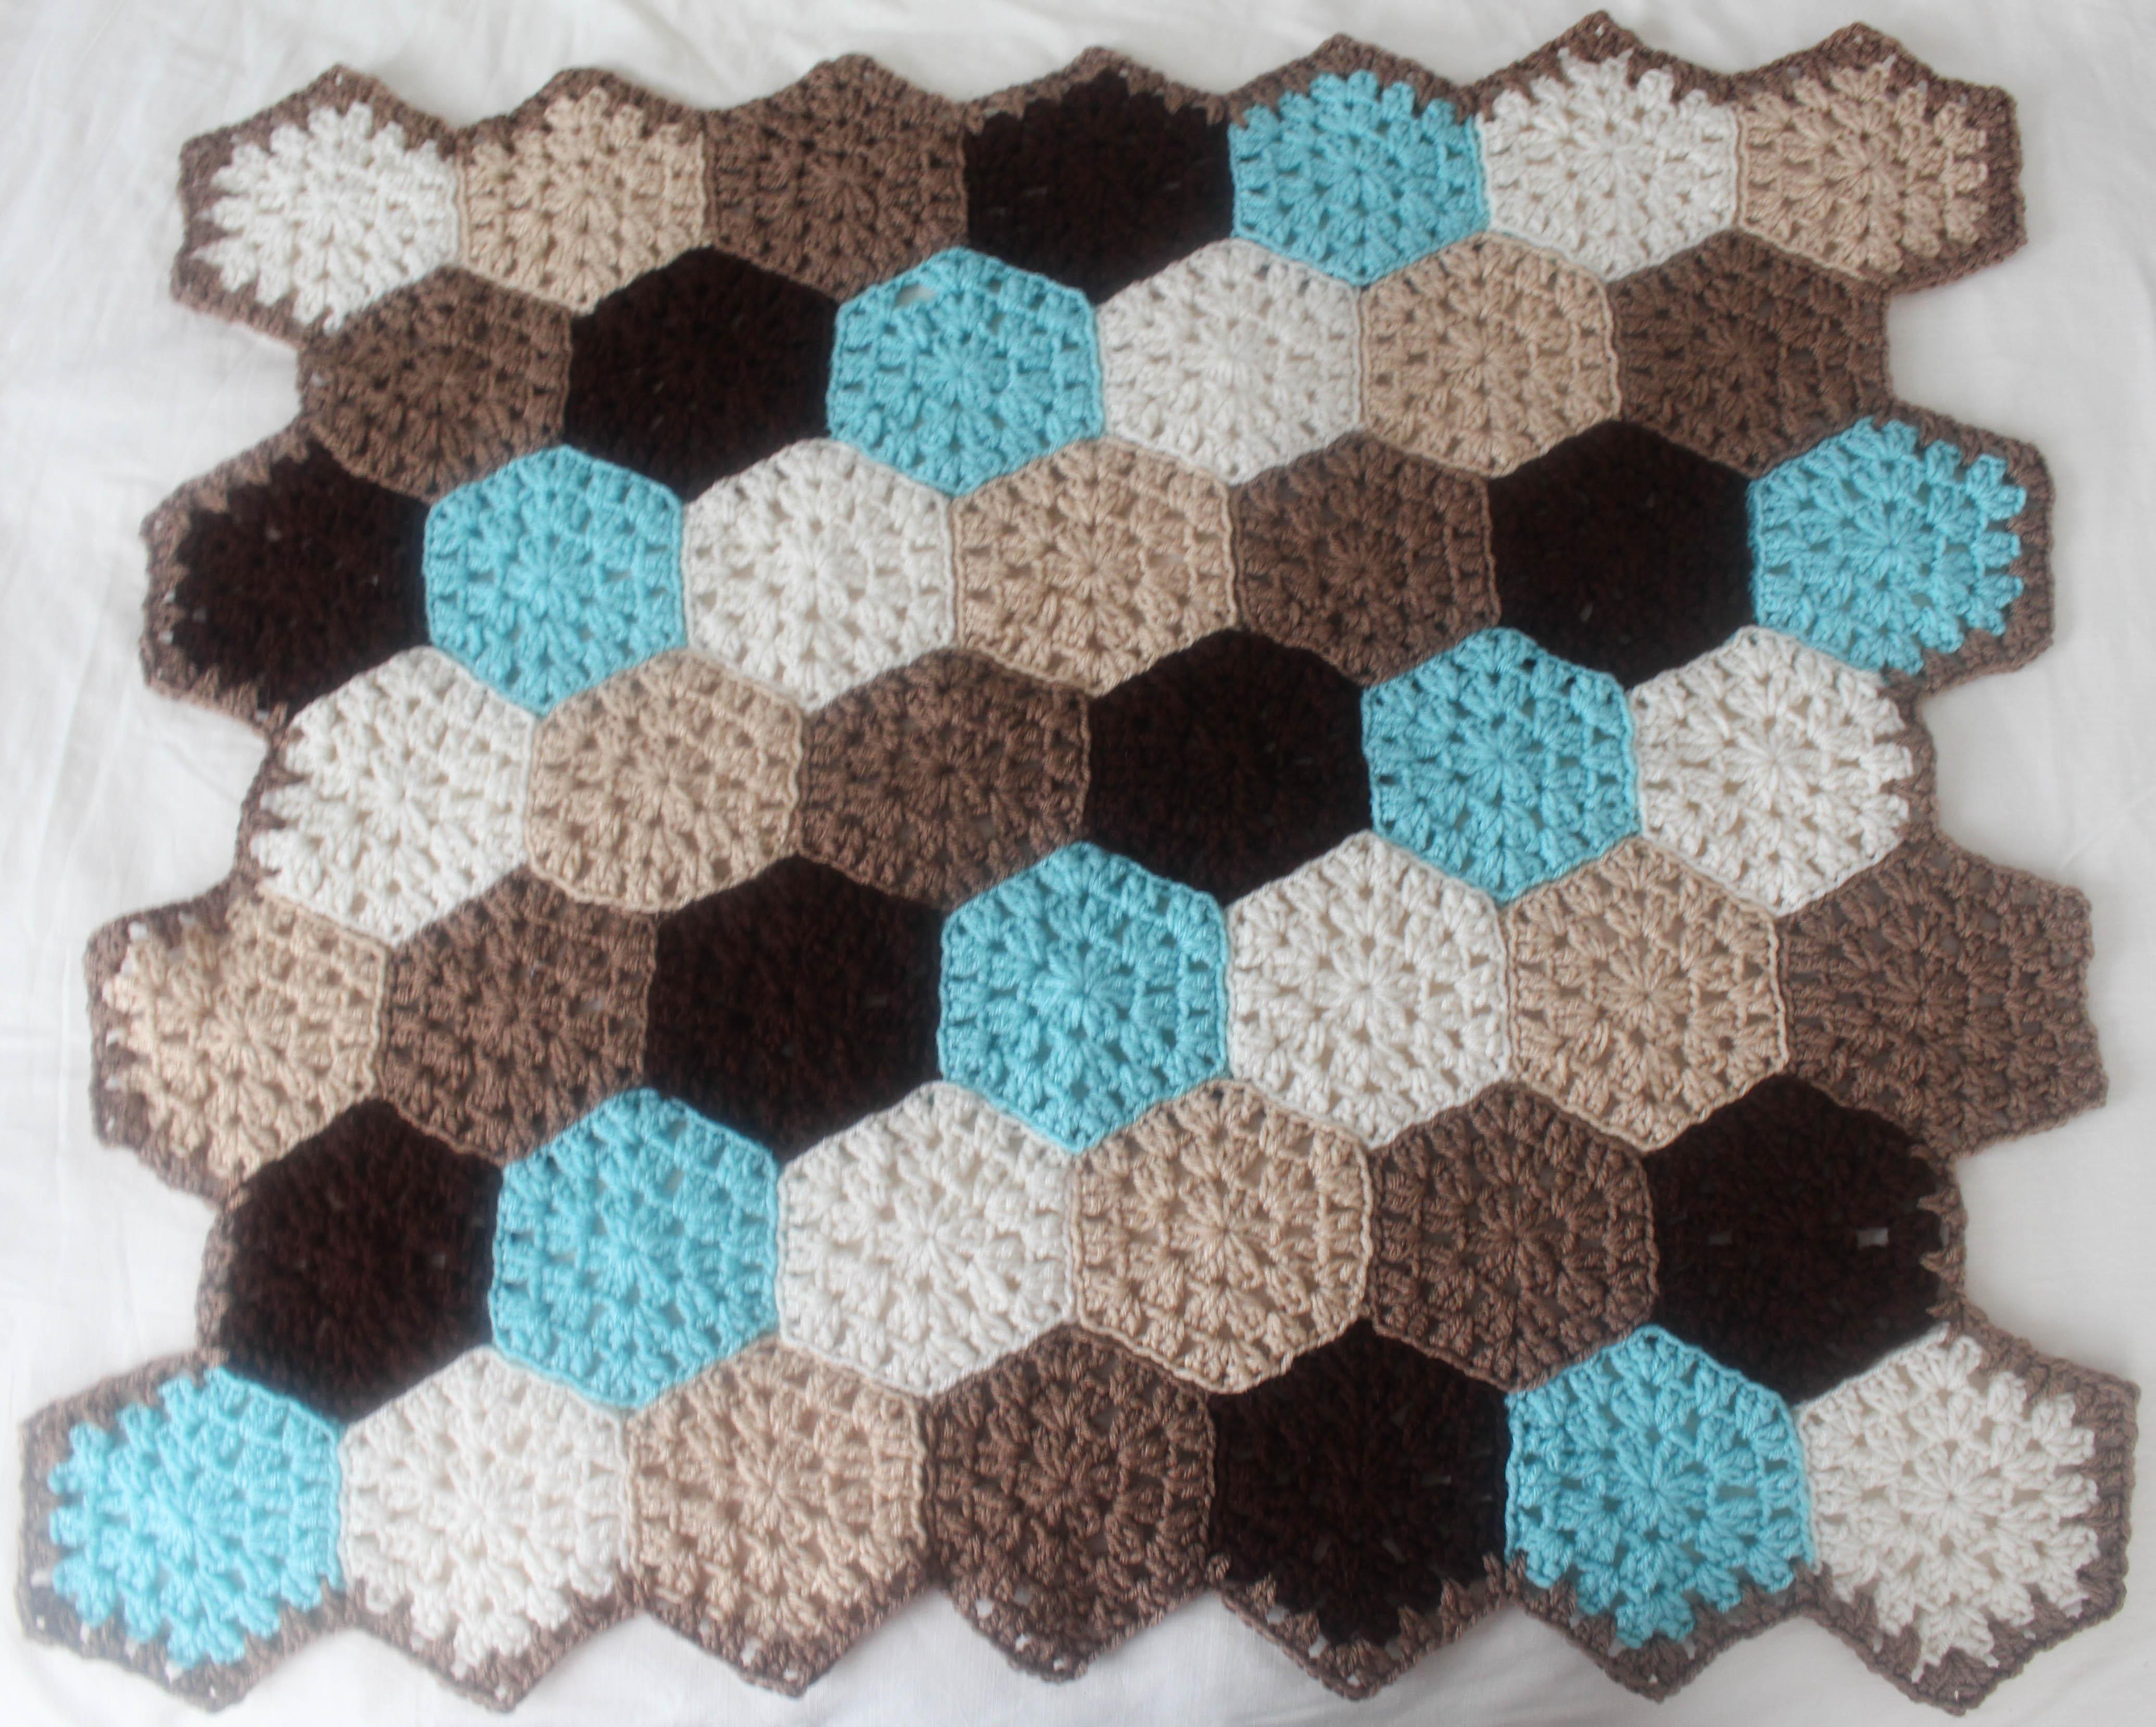 Free Crochet Pattern: Hexagon Honeycomb Stroller Blanket - Stitch ...